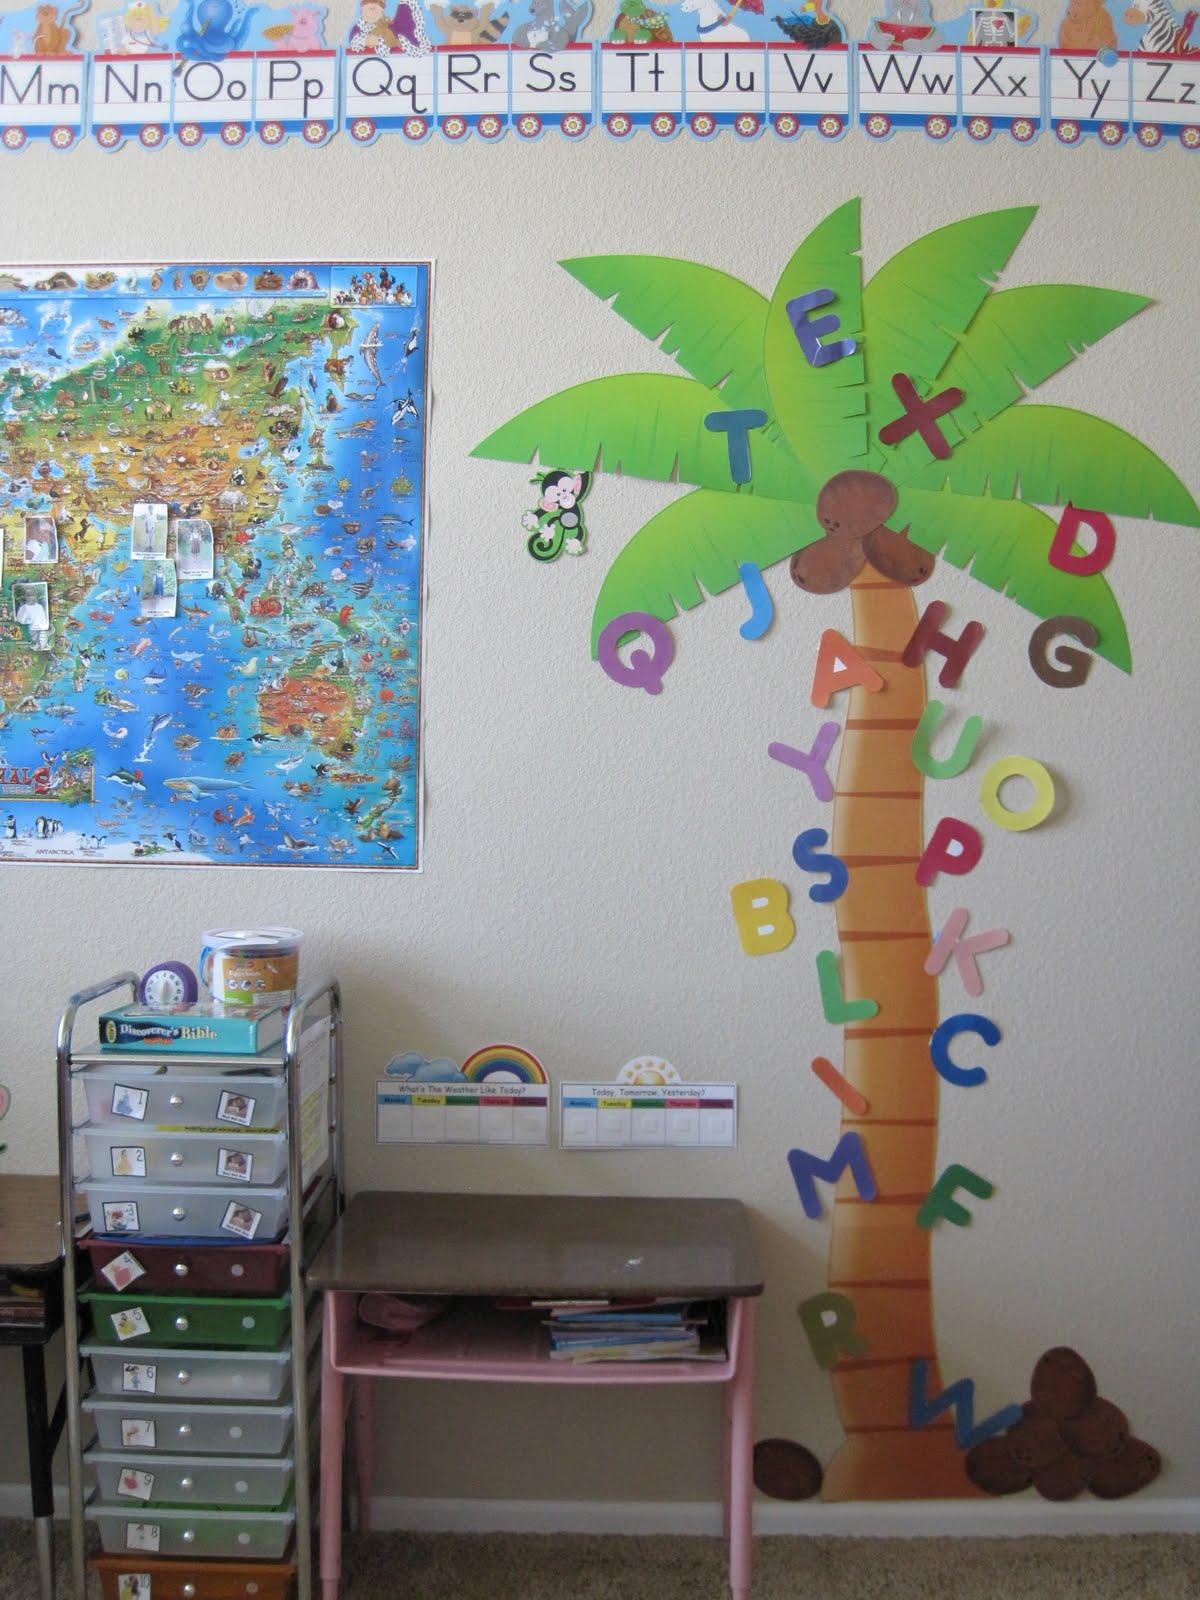 math worksheet : chicka chicka boom boom  confessions of a homeschooler : Chicka Chicka Boom Boom Worksheets For Kindergarten